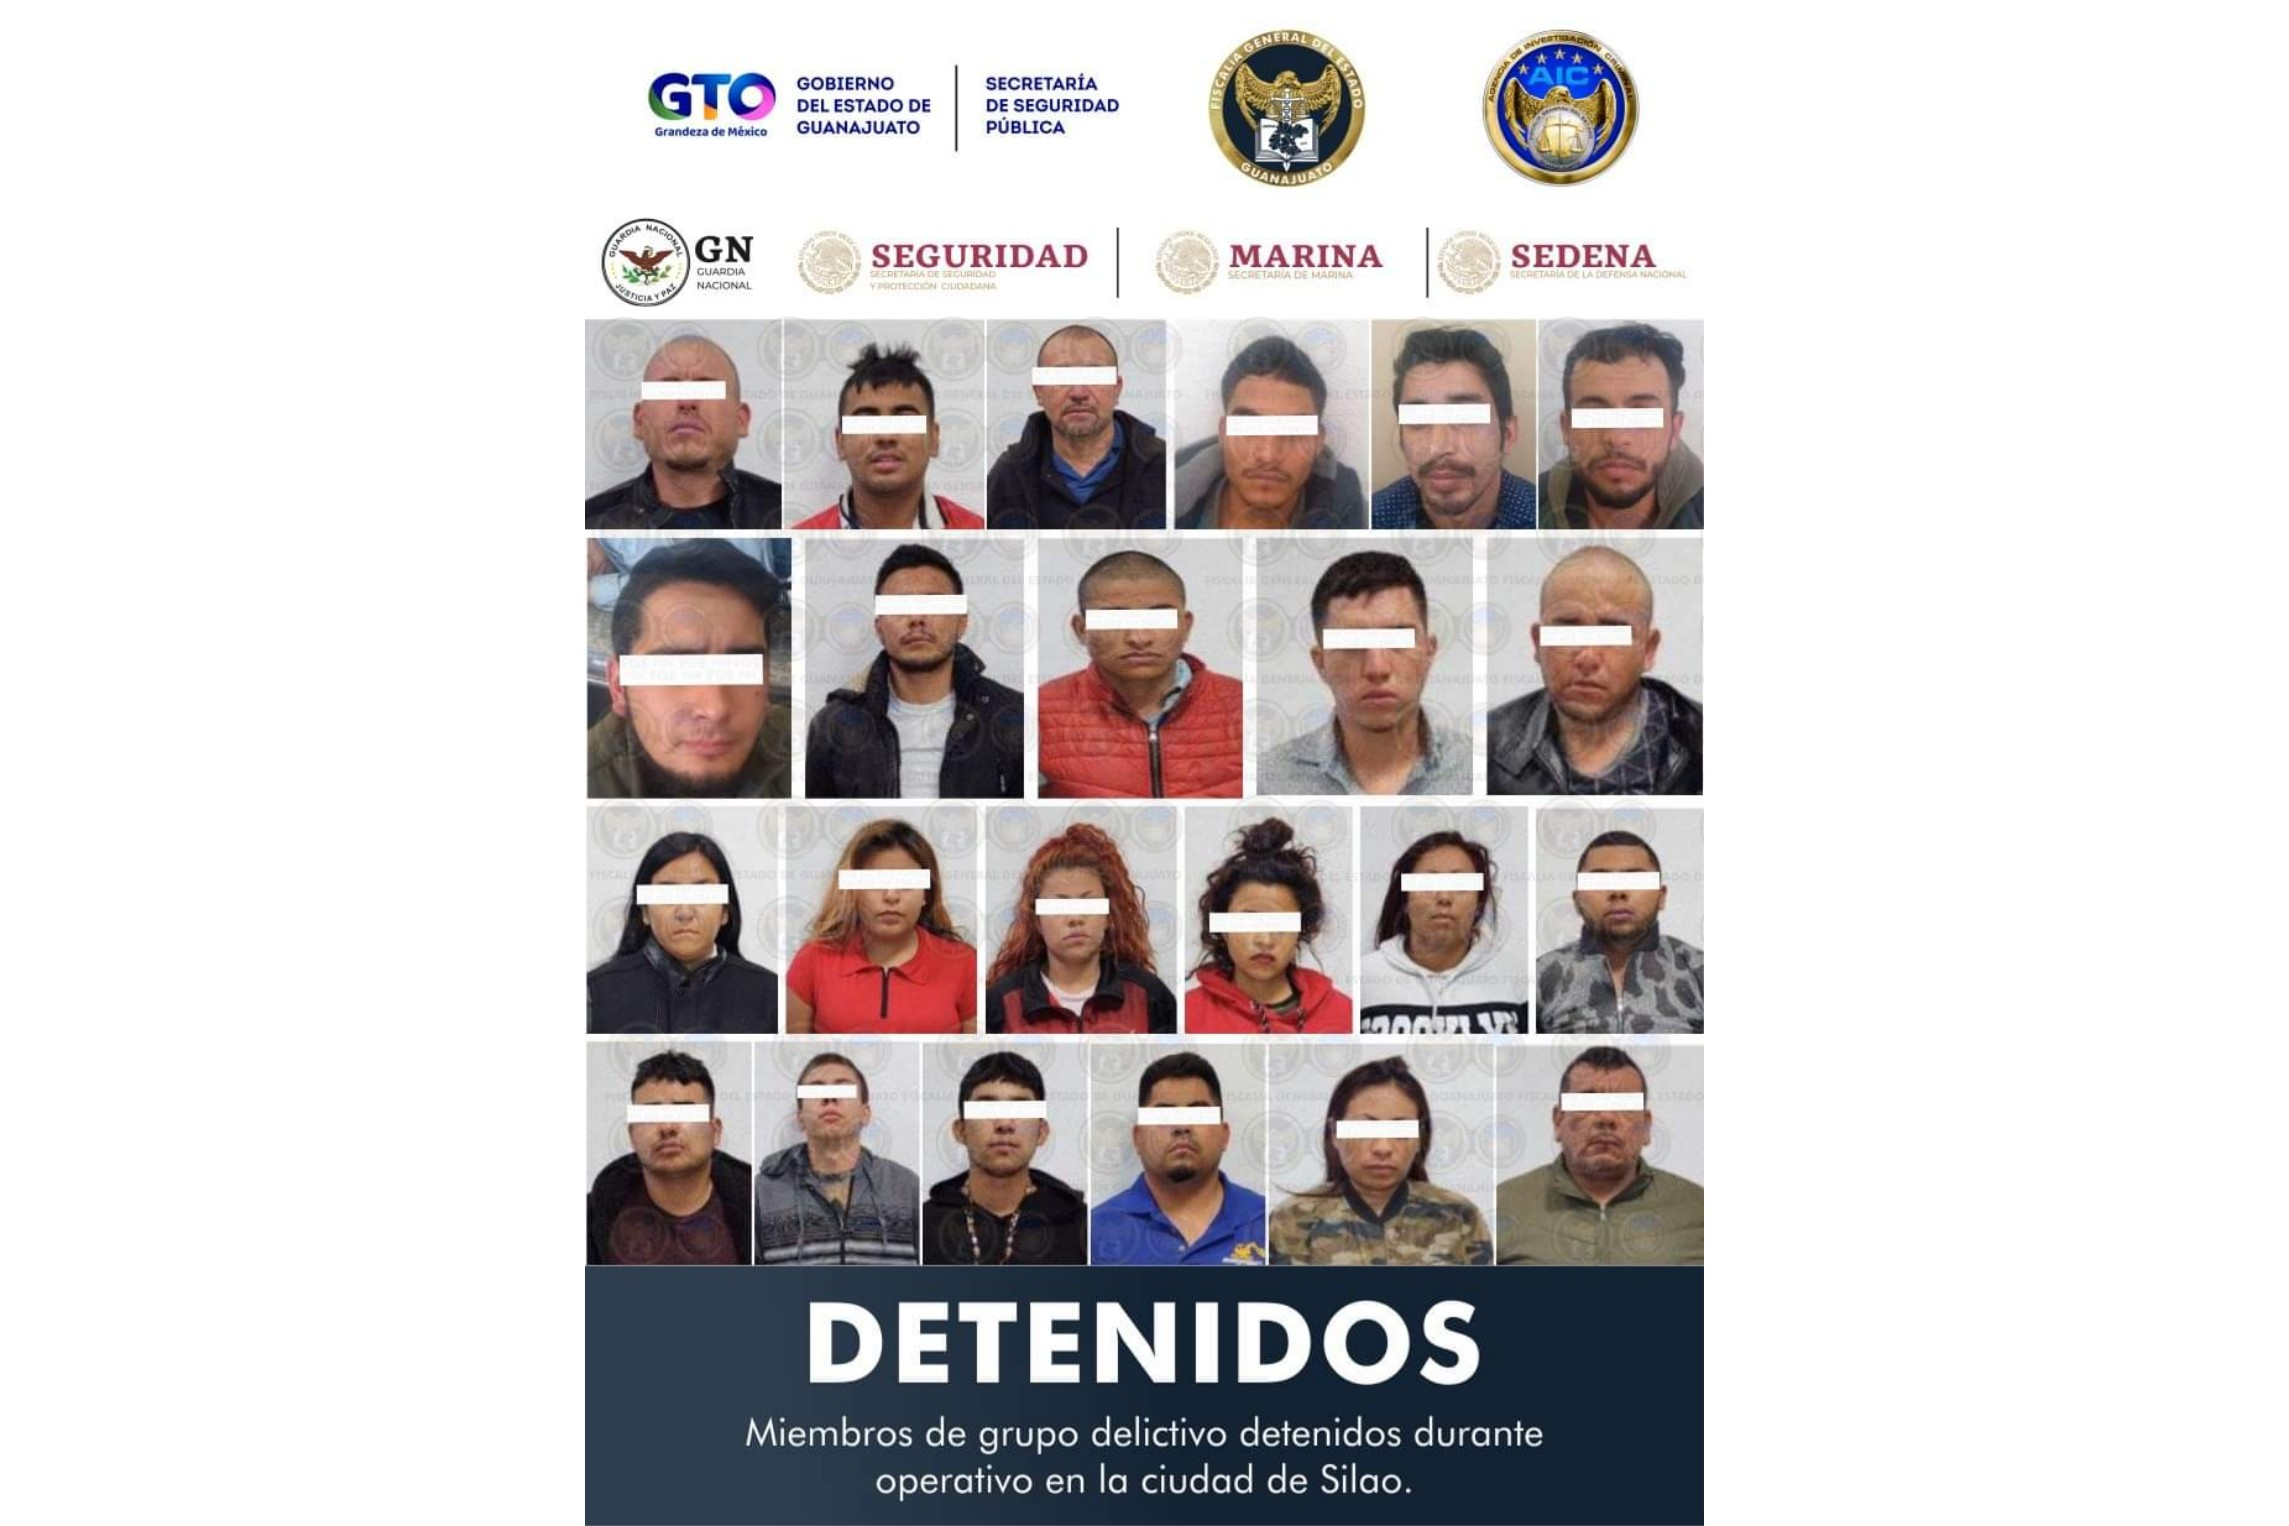 DETIENEN A 24 MIEMBROS DE GRUPO CRIMINAL, DECOMISAN ARSENAL Y LIBERAN A PLAGIADO 1